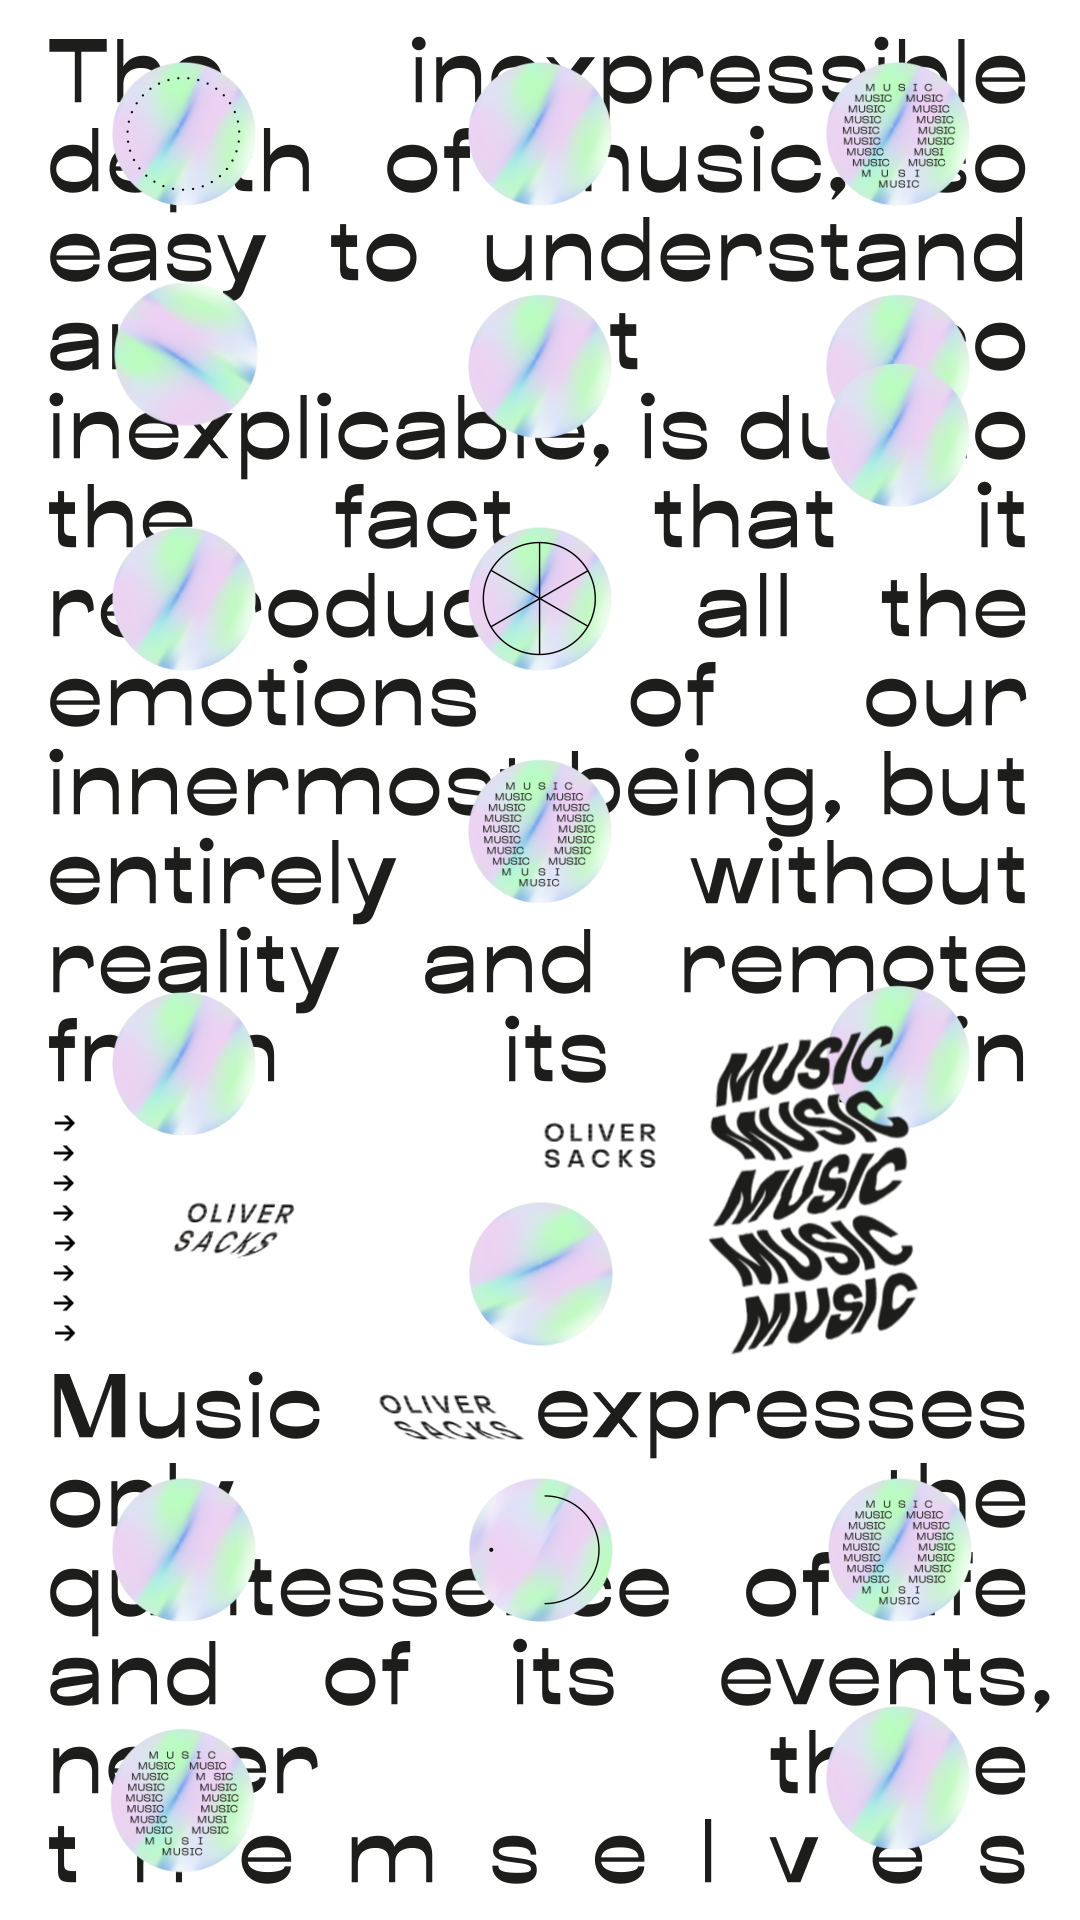 FormatWars_Musicophilia_3.png